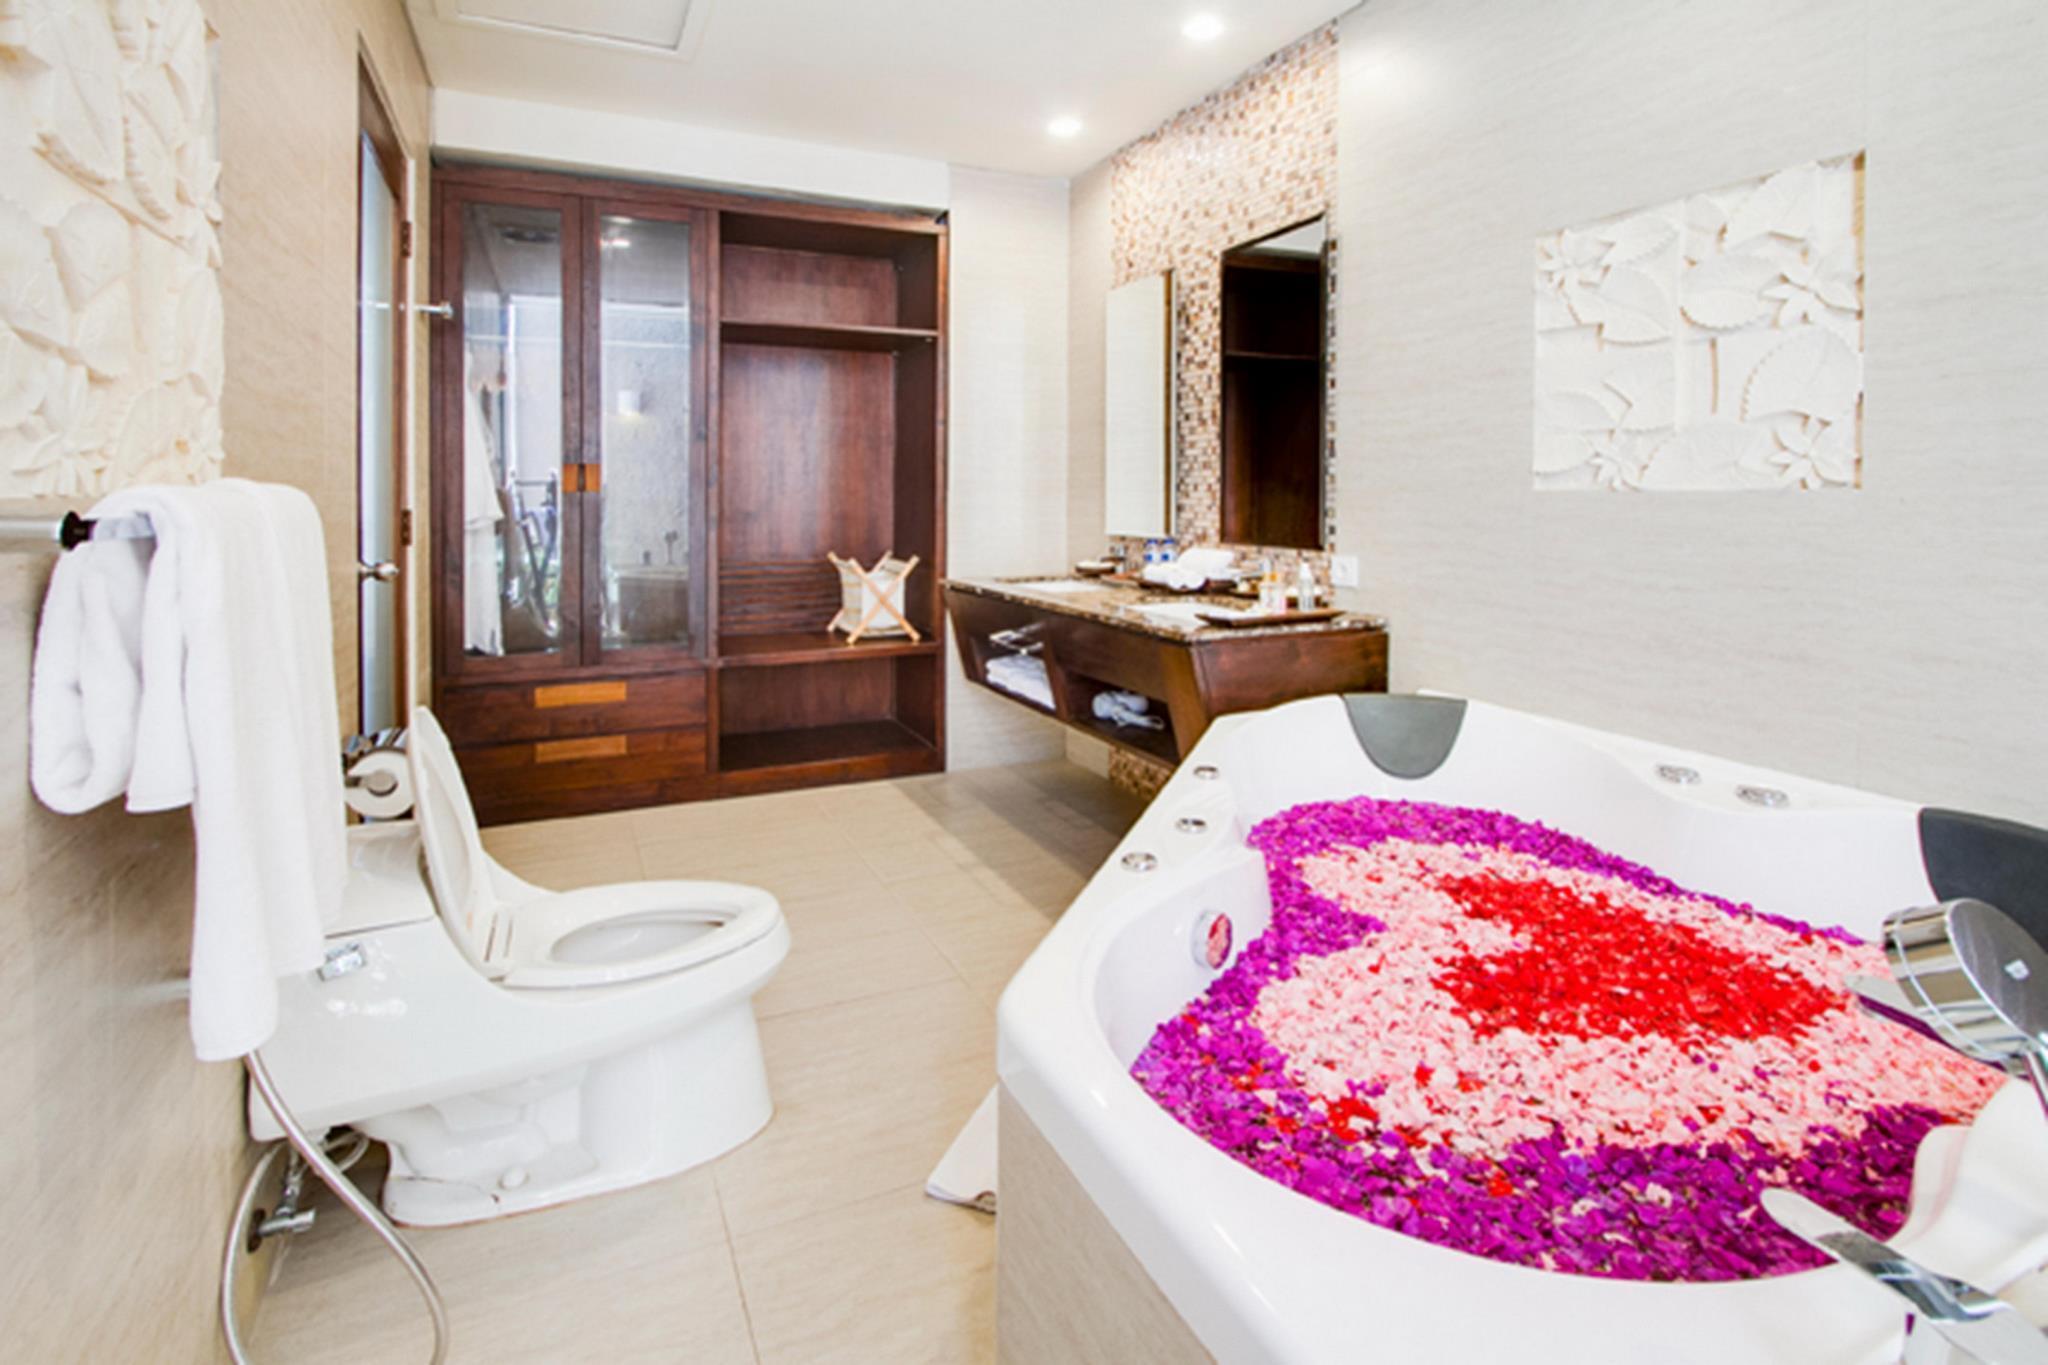 ULA Villas Bali 1 BDR Private Villas with Jacuzzi